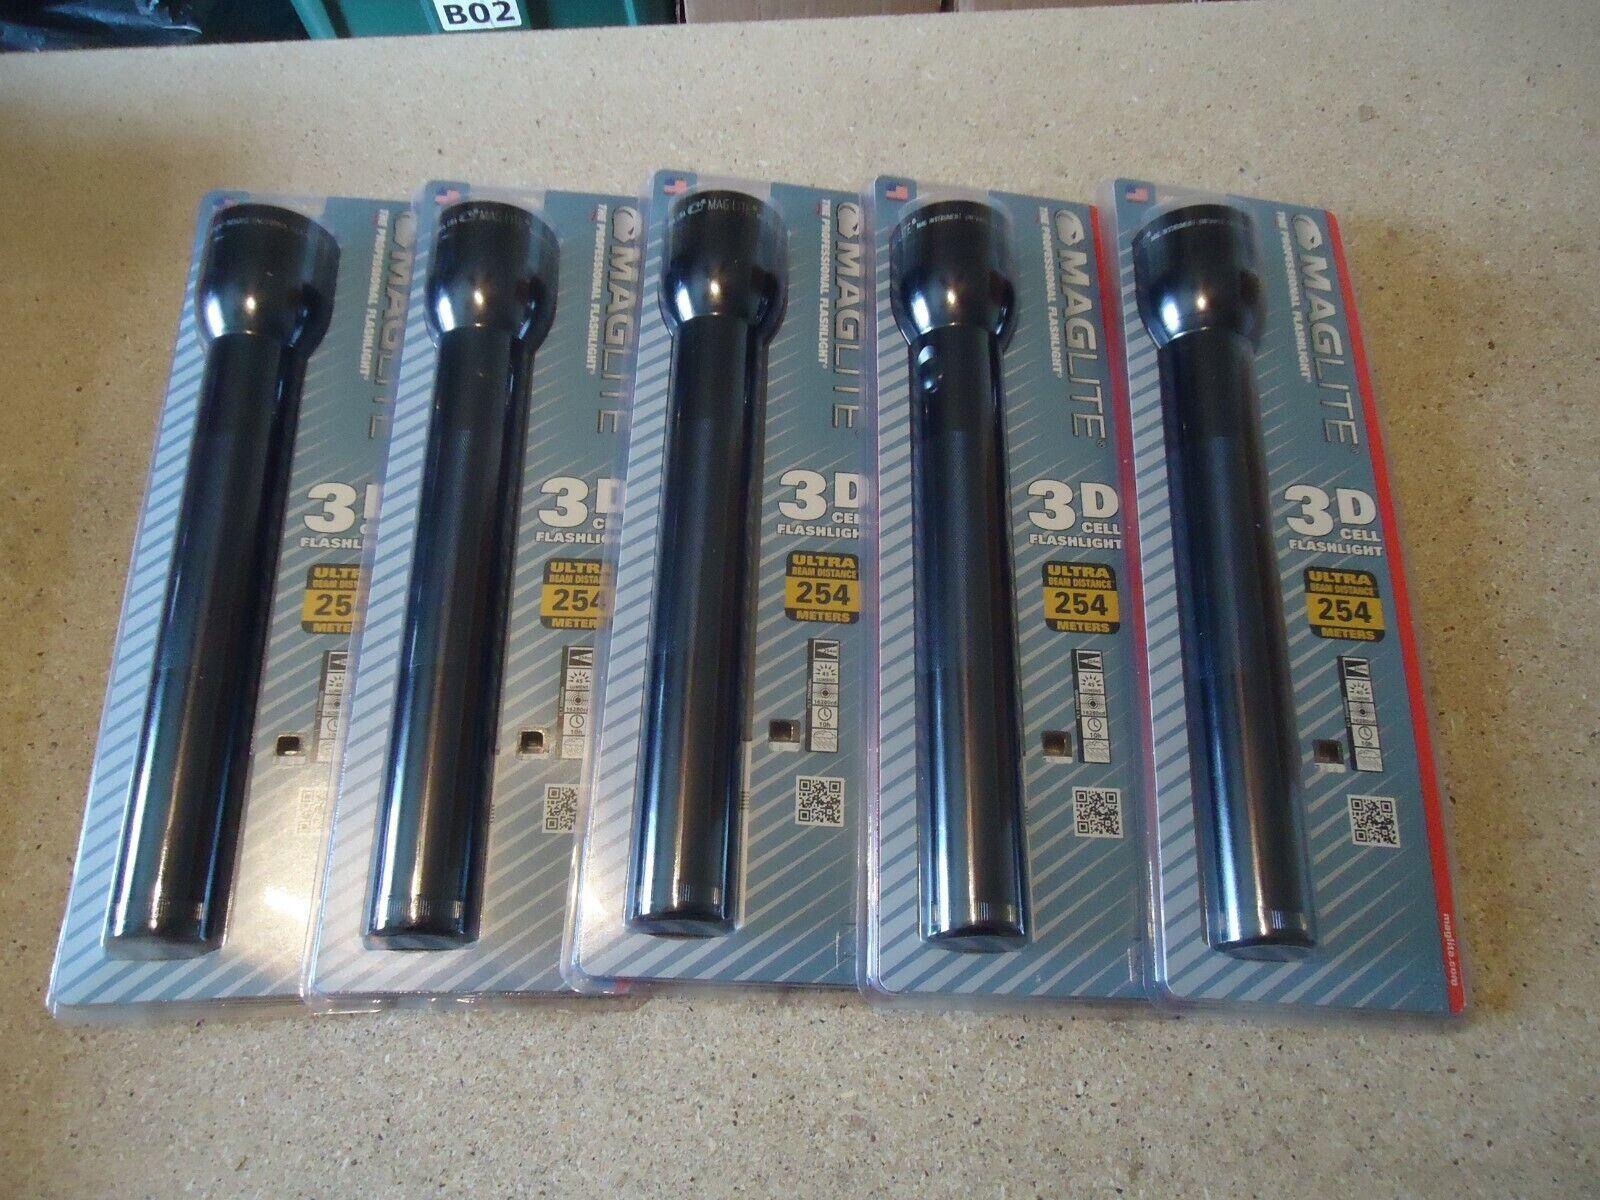 Mag-Lite 3D Linterna Profesional Celular 5PC Lote de 254 metros nuevo viejo Stock nuevo en paquete TS3D016K